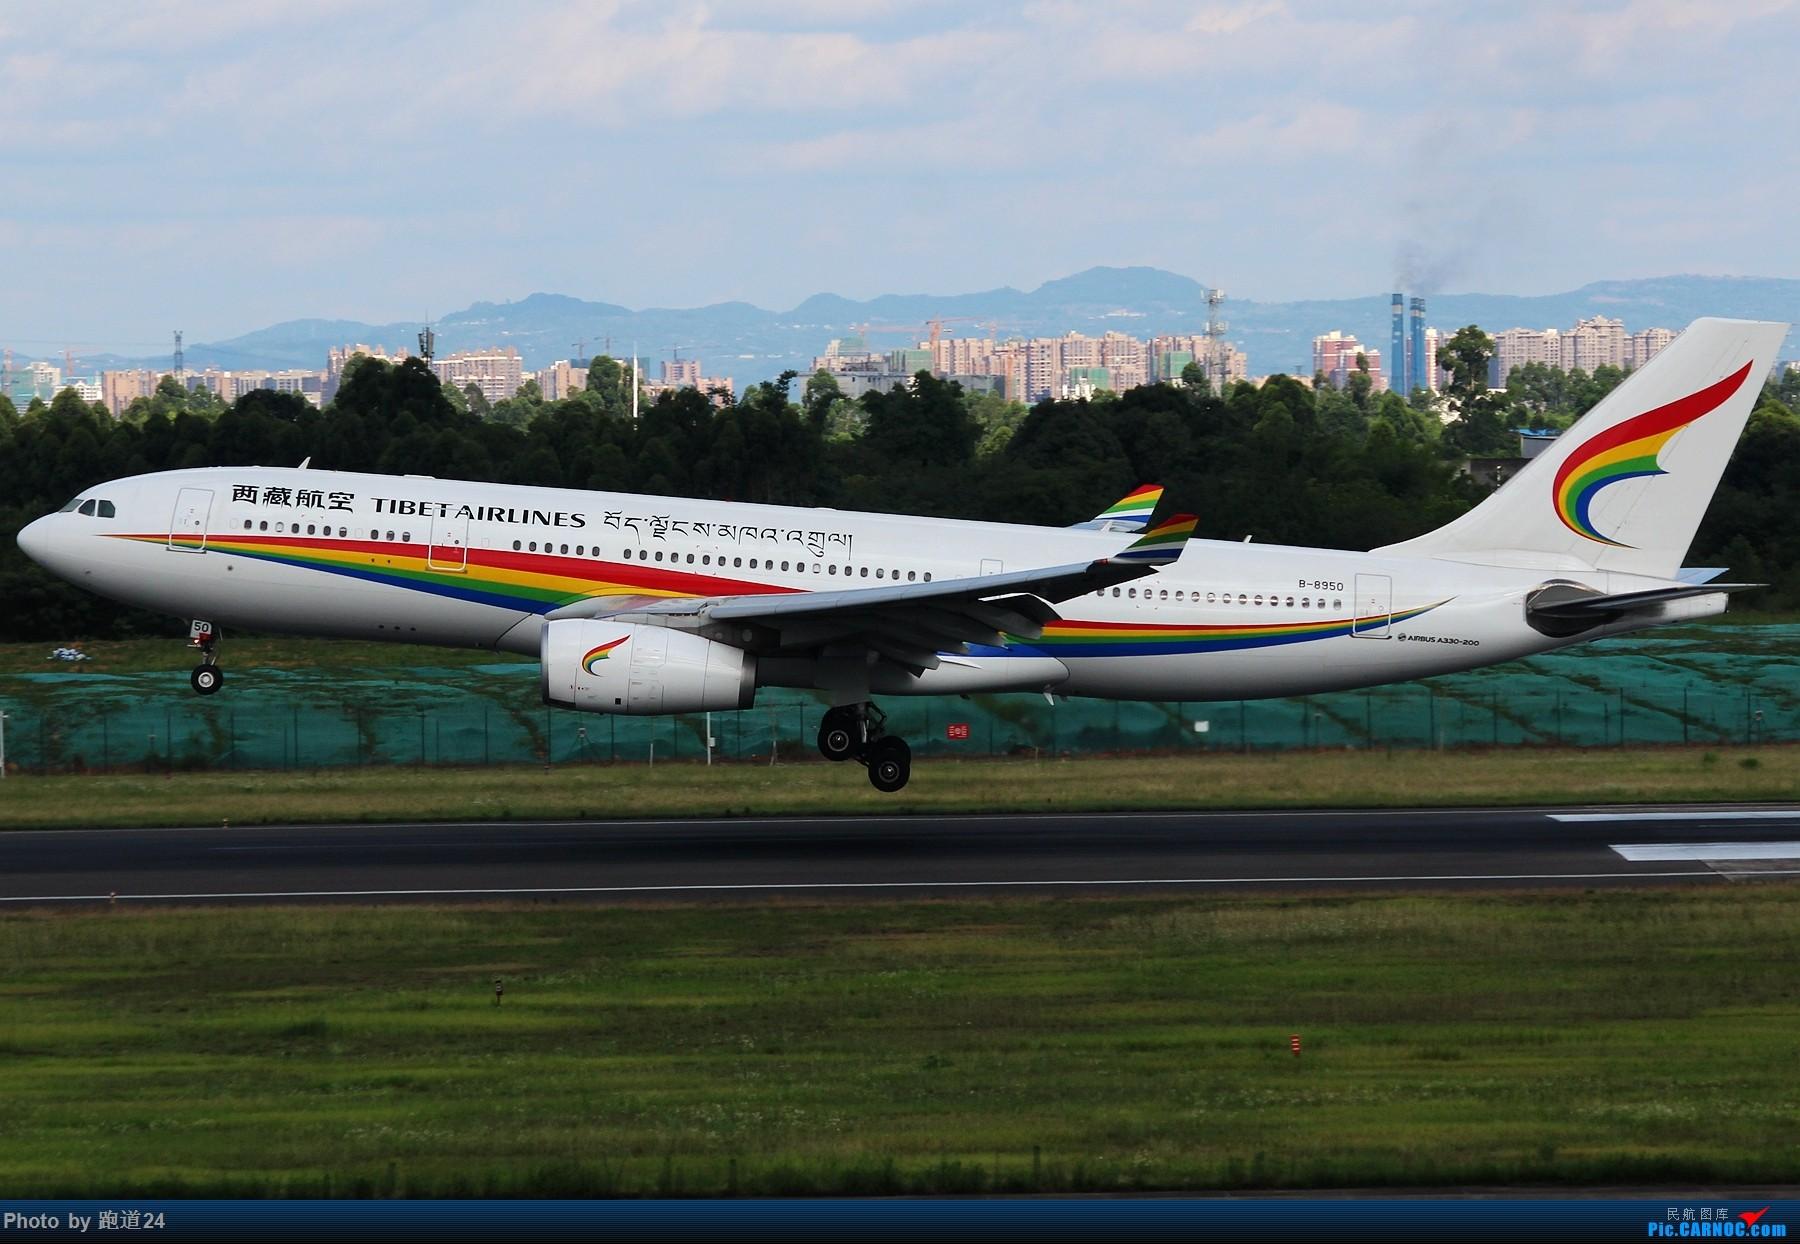 Re:[原创]【多图党】6月18日成都拍机【埃塞俄比亚航空B777-200LR】 AIRBUS A330-200 B-8950 中国成都双流国际机场